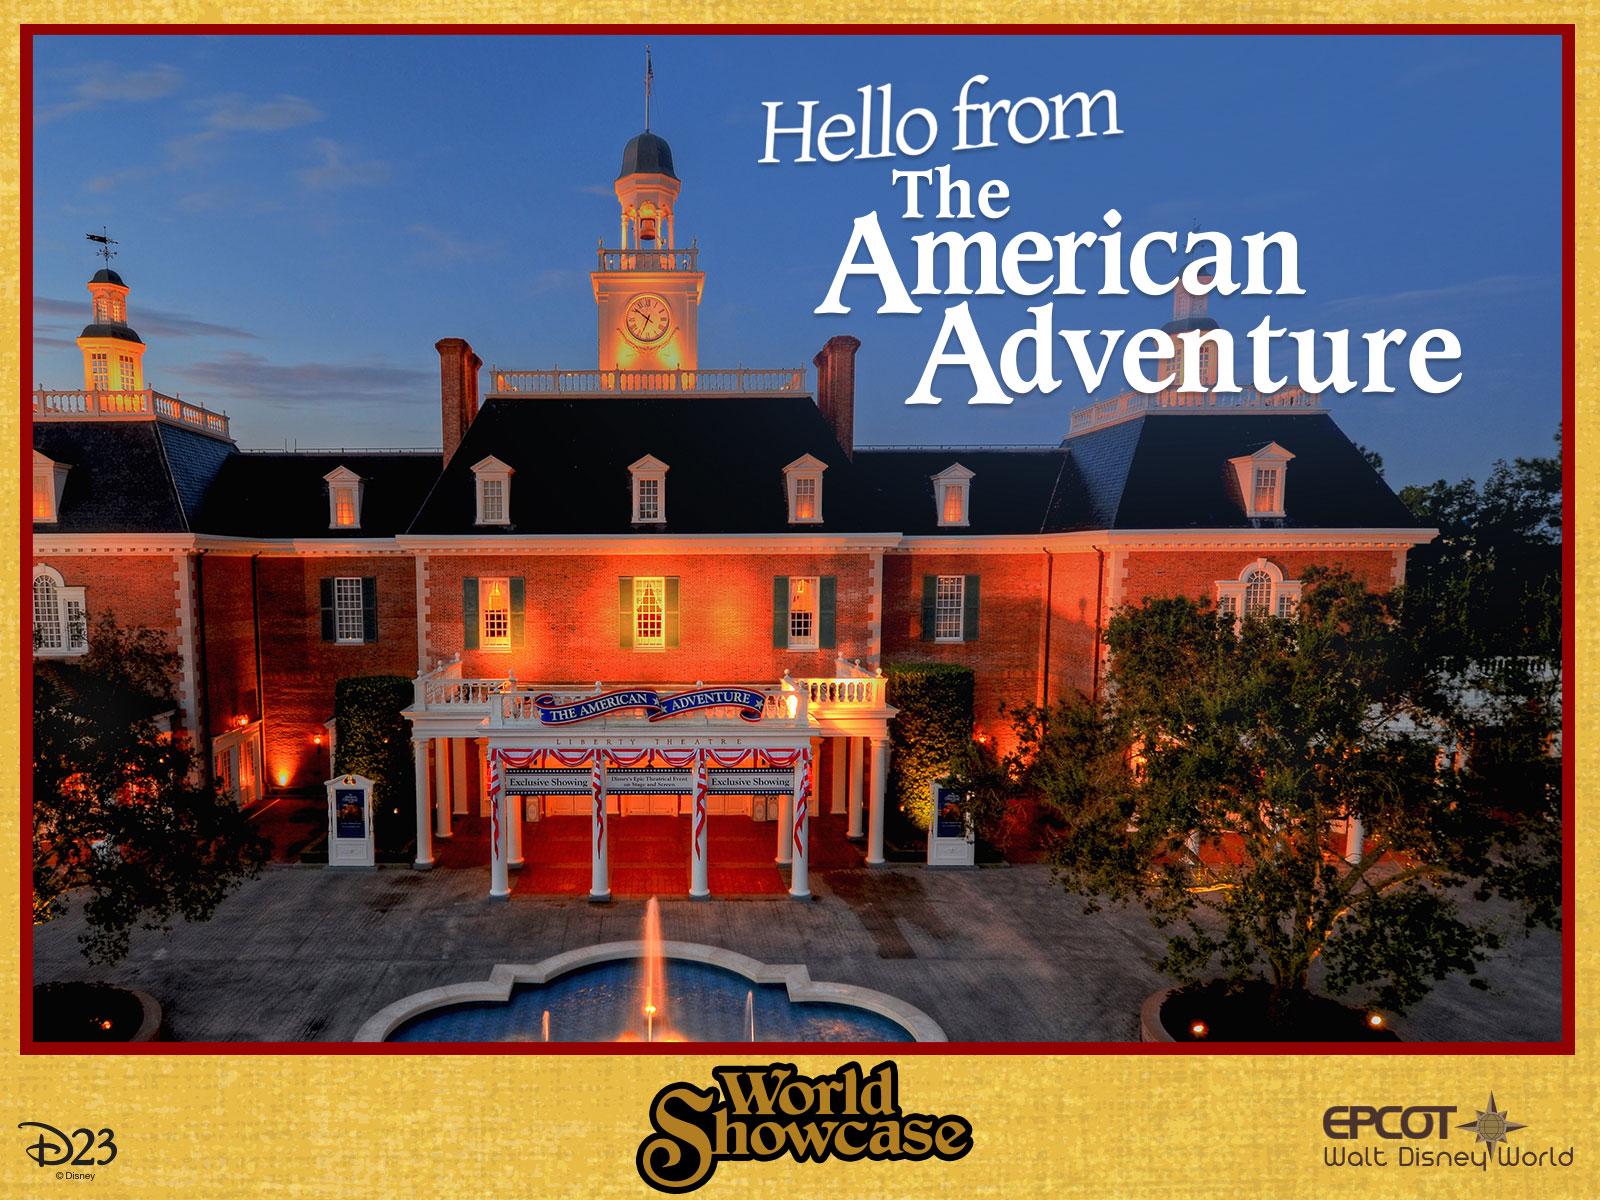 The American Adventure pavilion postcard